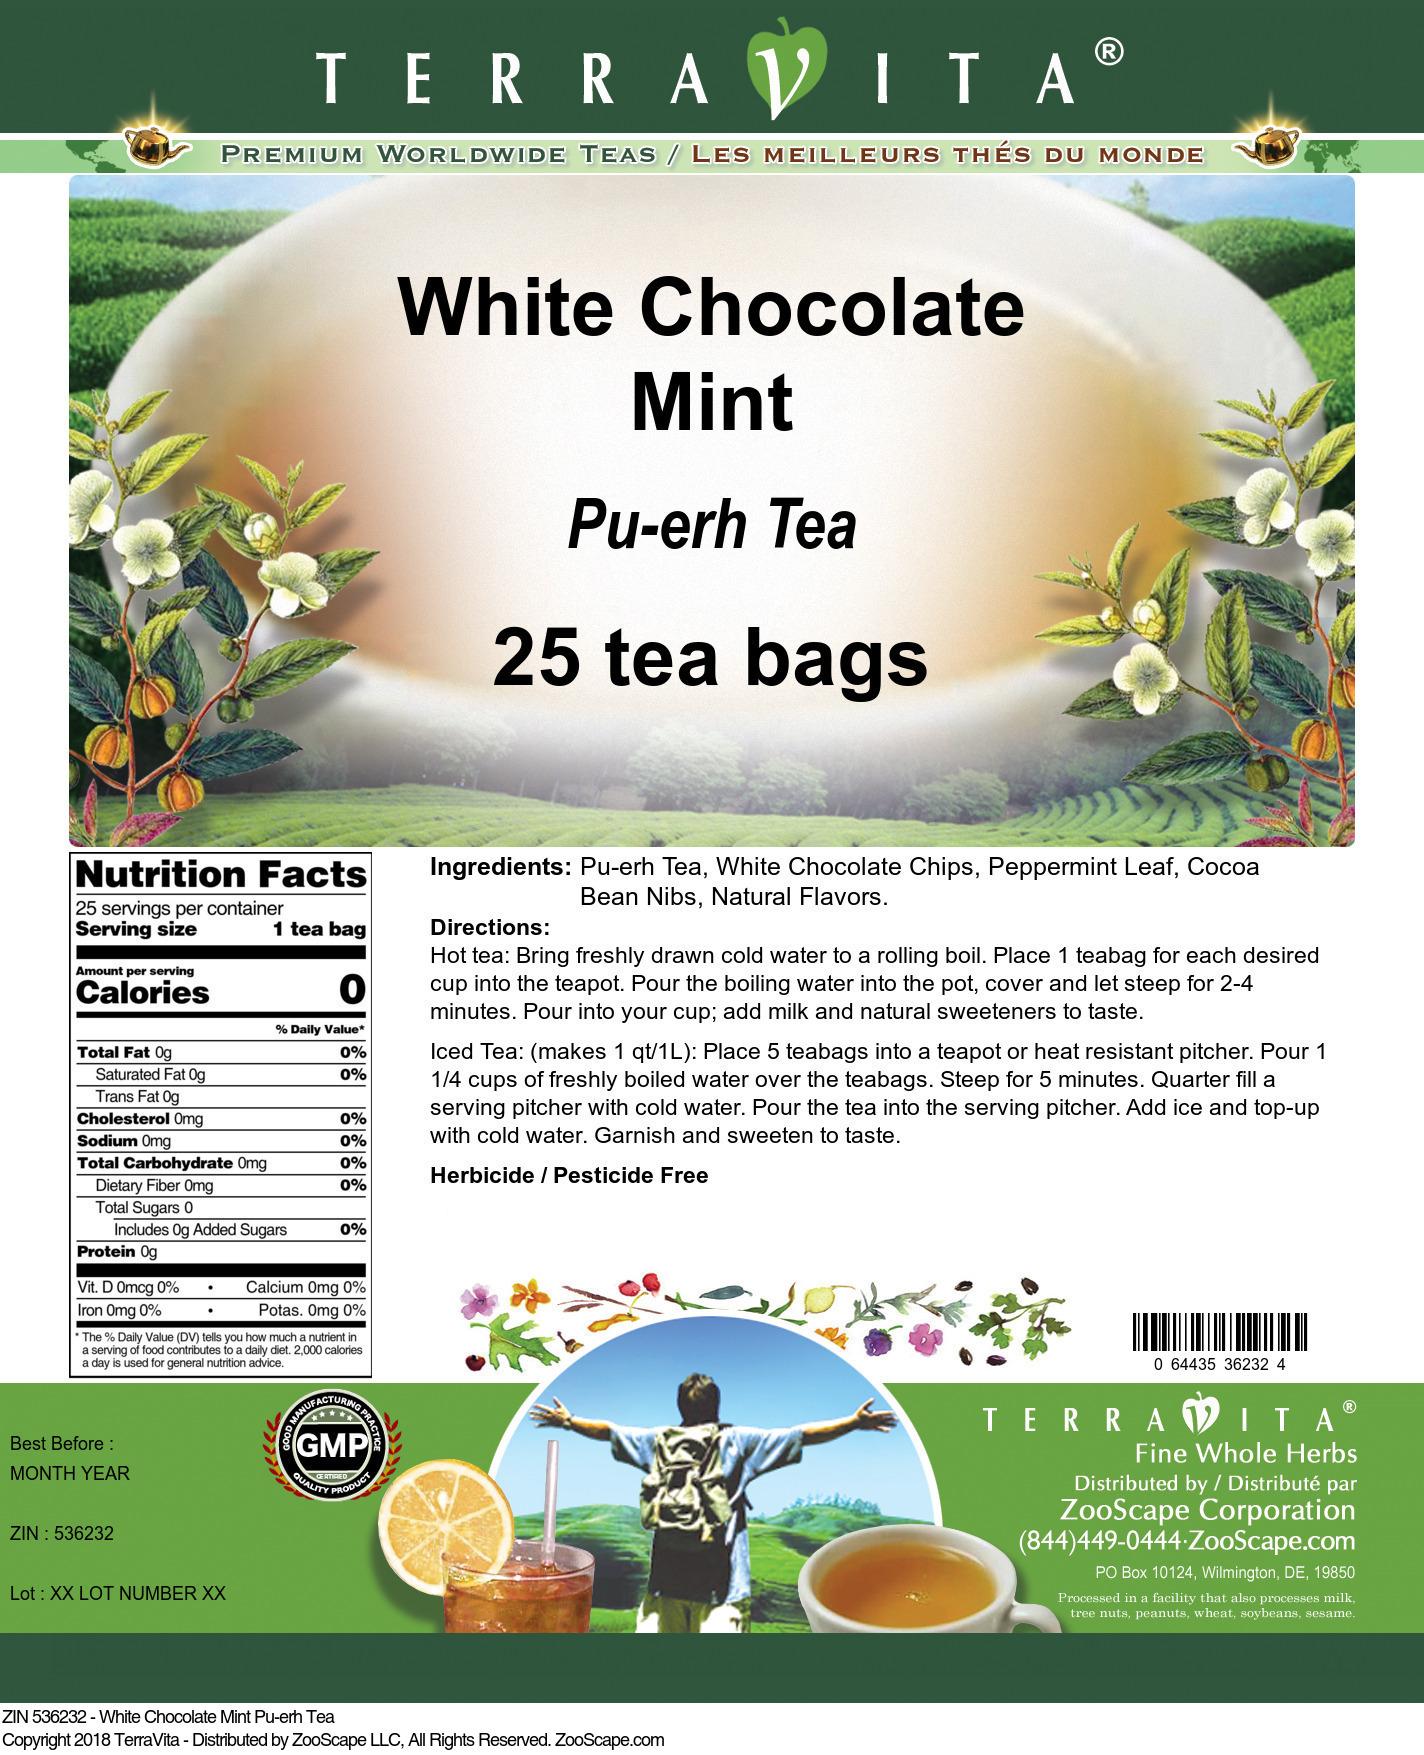 White Chocolate Mint Pu-erh Tea